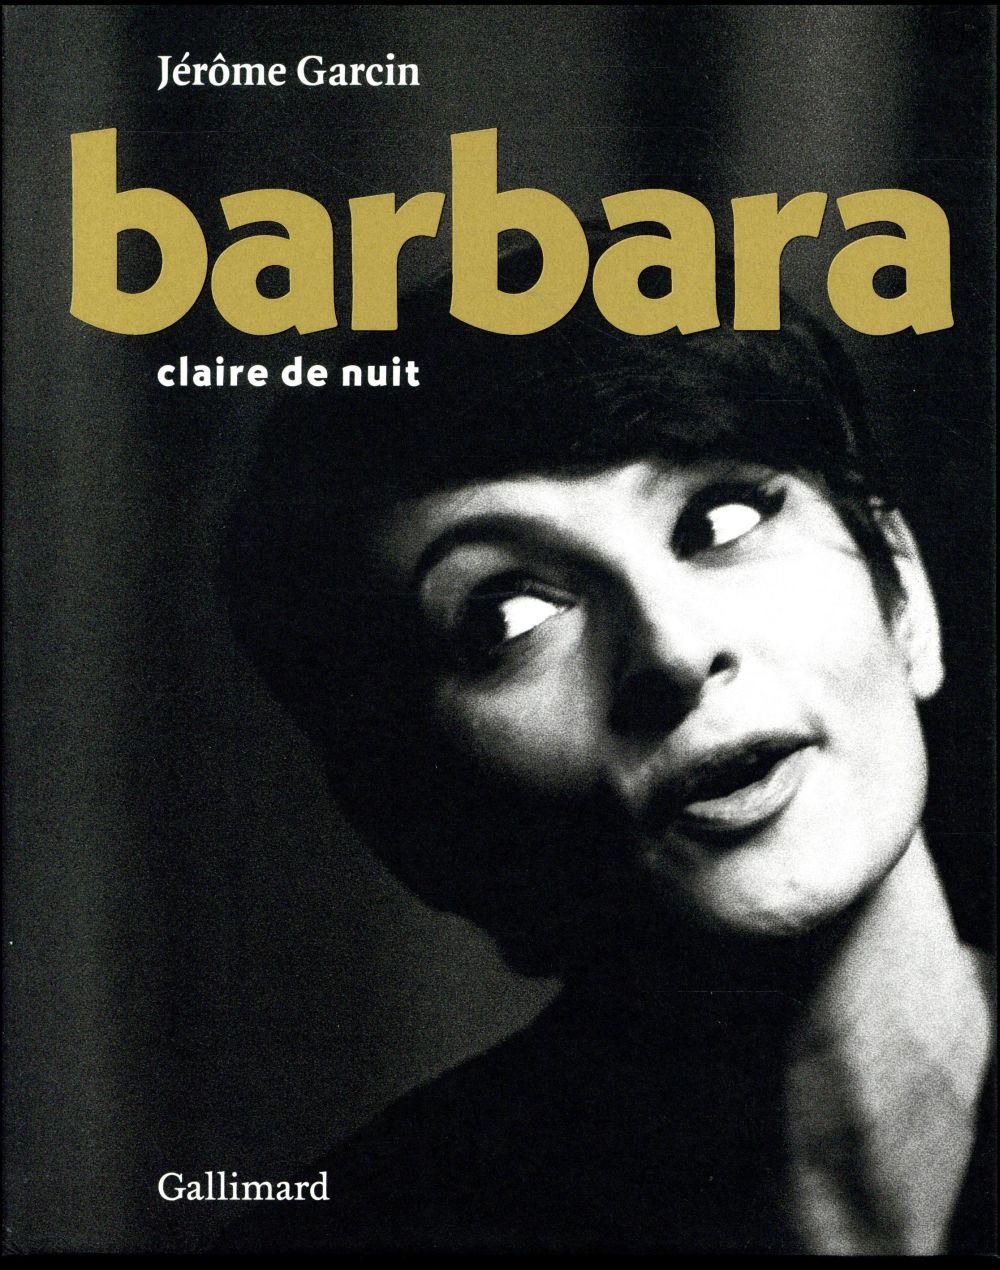 Barbara, claire de nuit